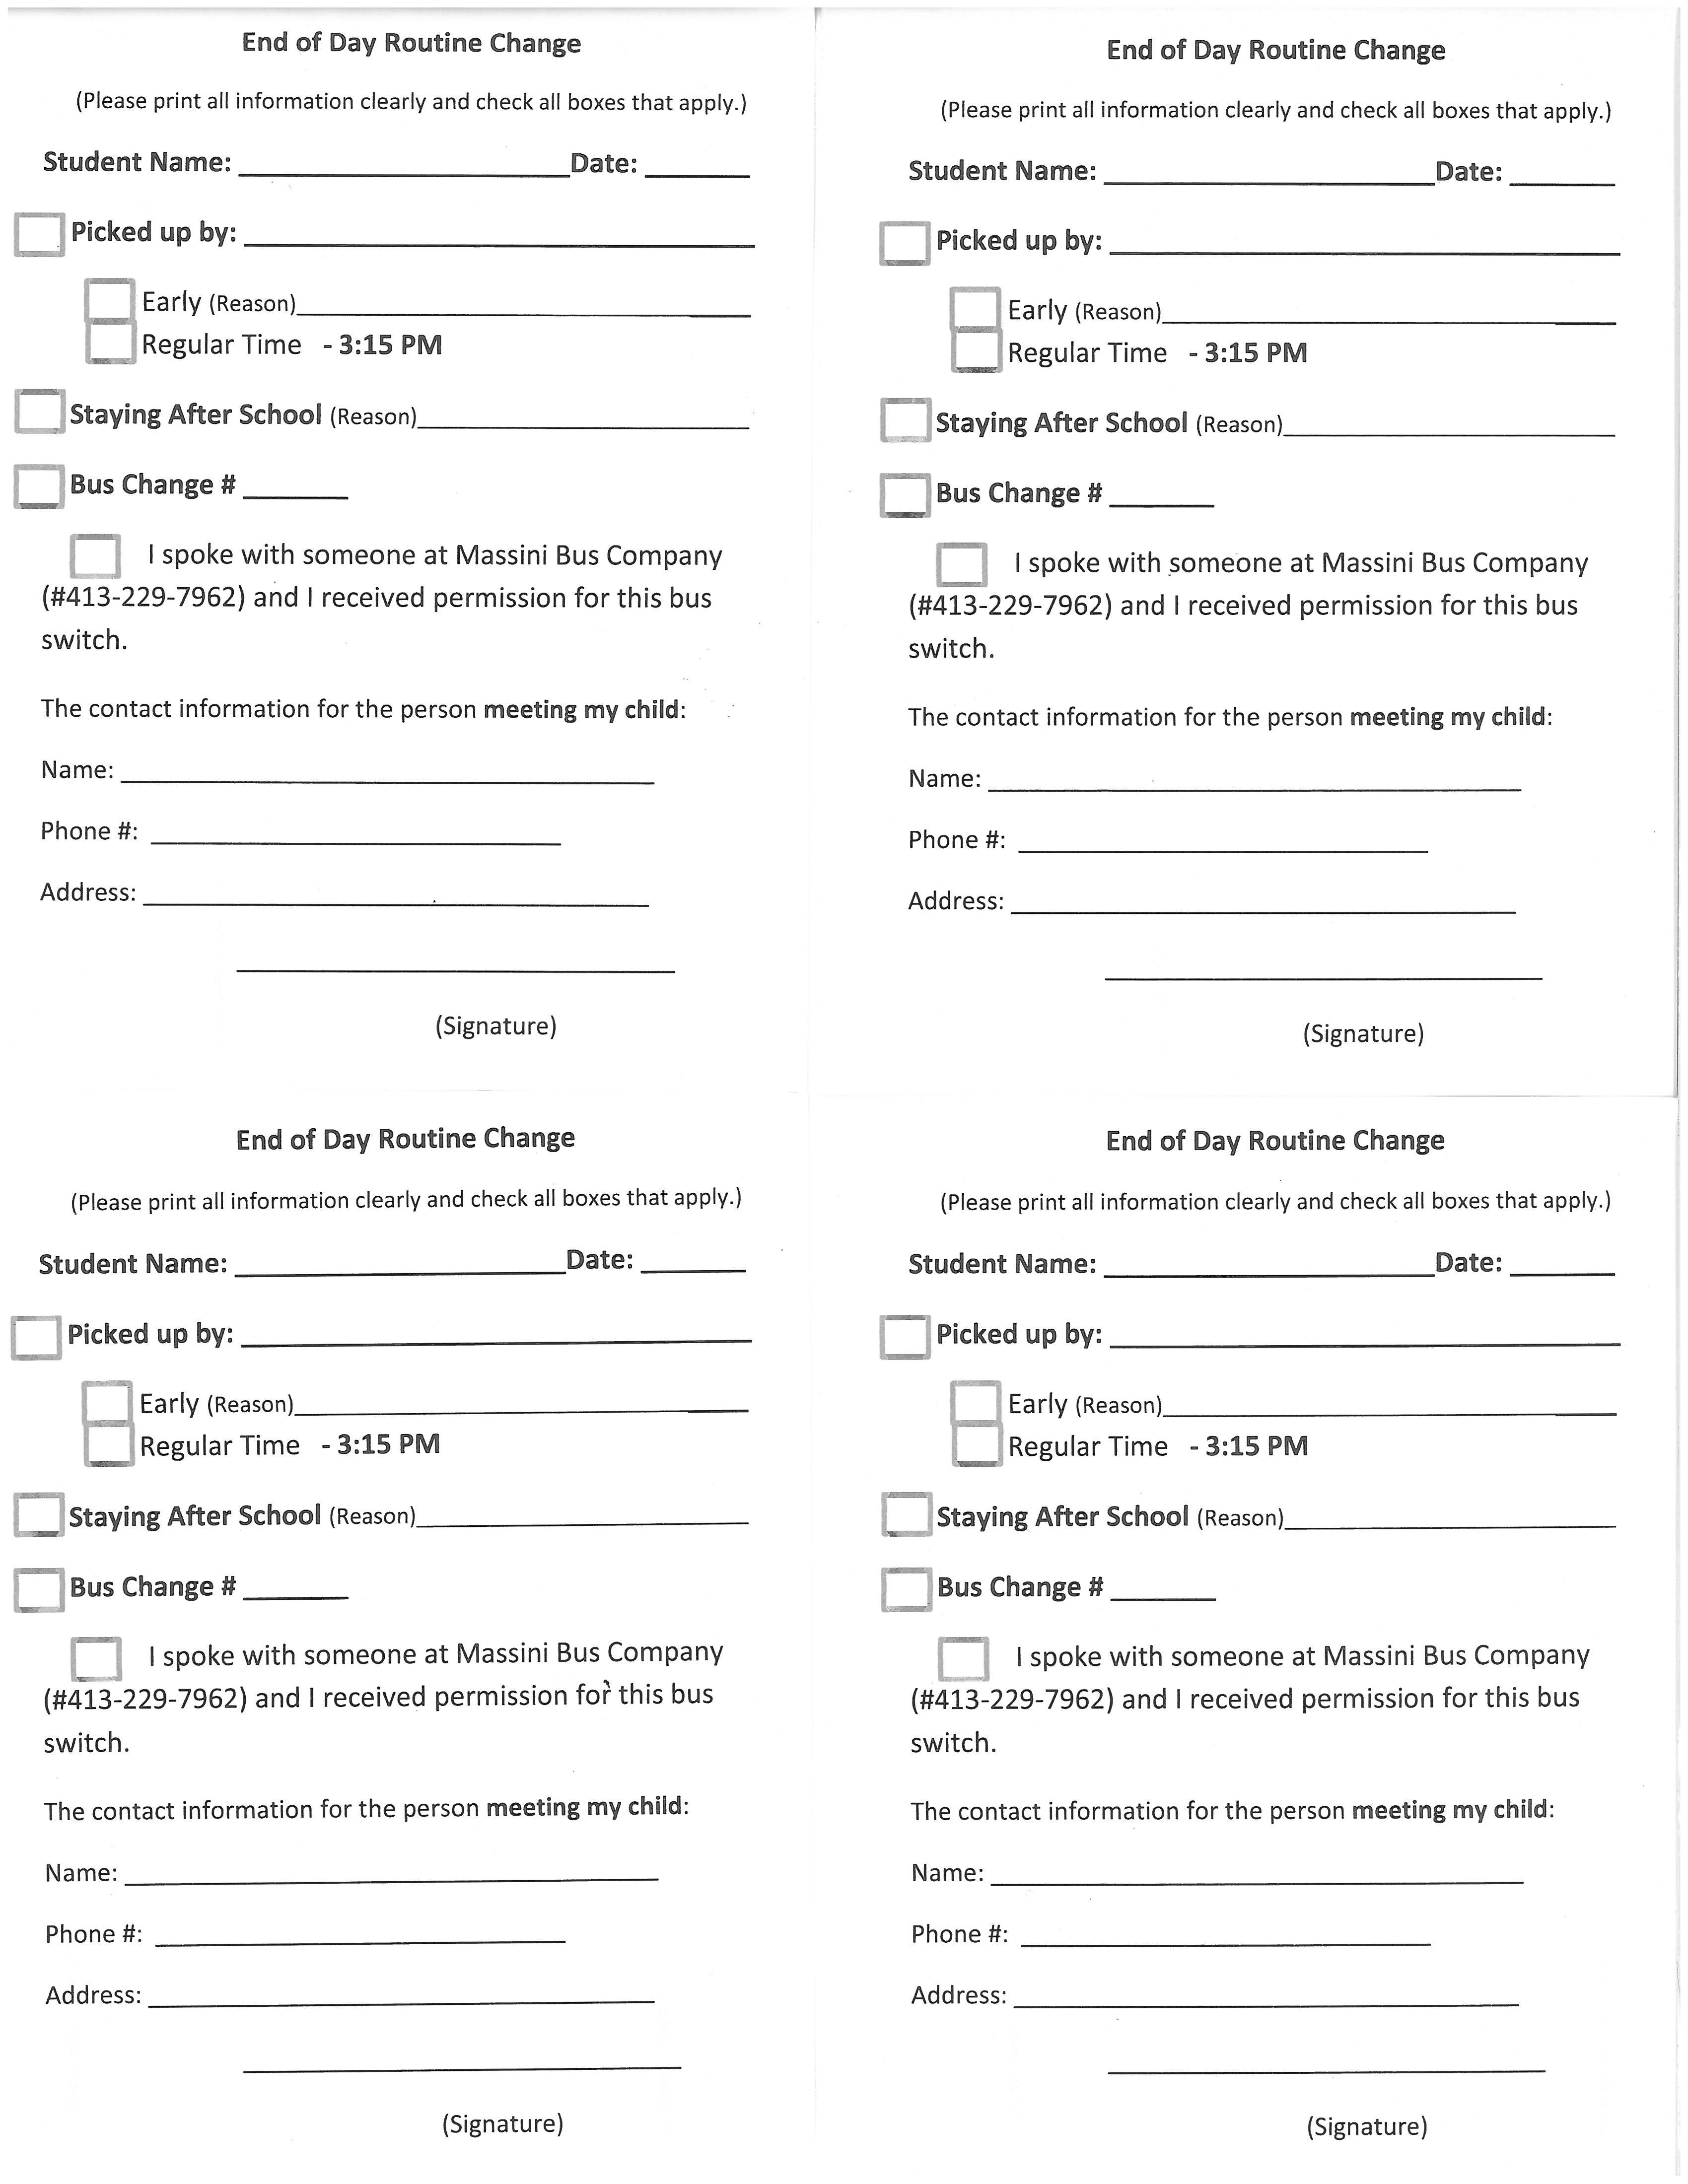 Change In Dismissal Form Muddy Brook Regional Elementary School Change In  Dismissal Form Change In Dismissal Form Change Of Address Printable Form  Print Change Of Address Form